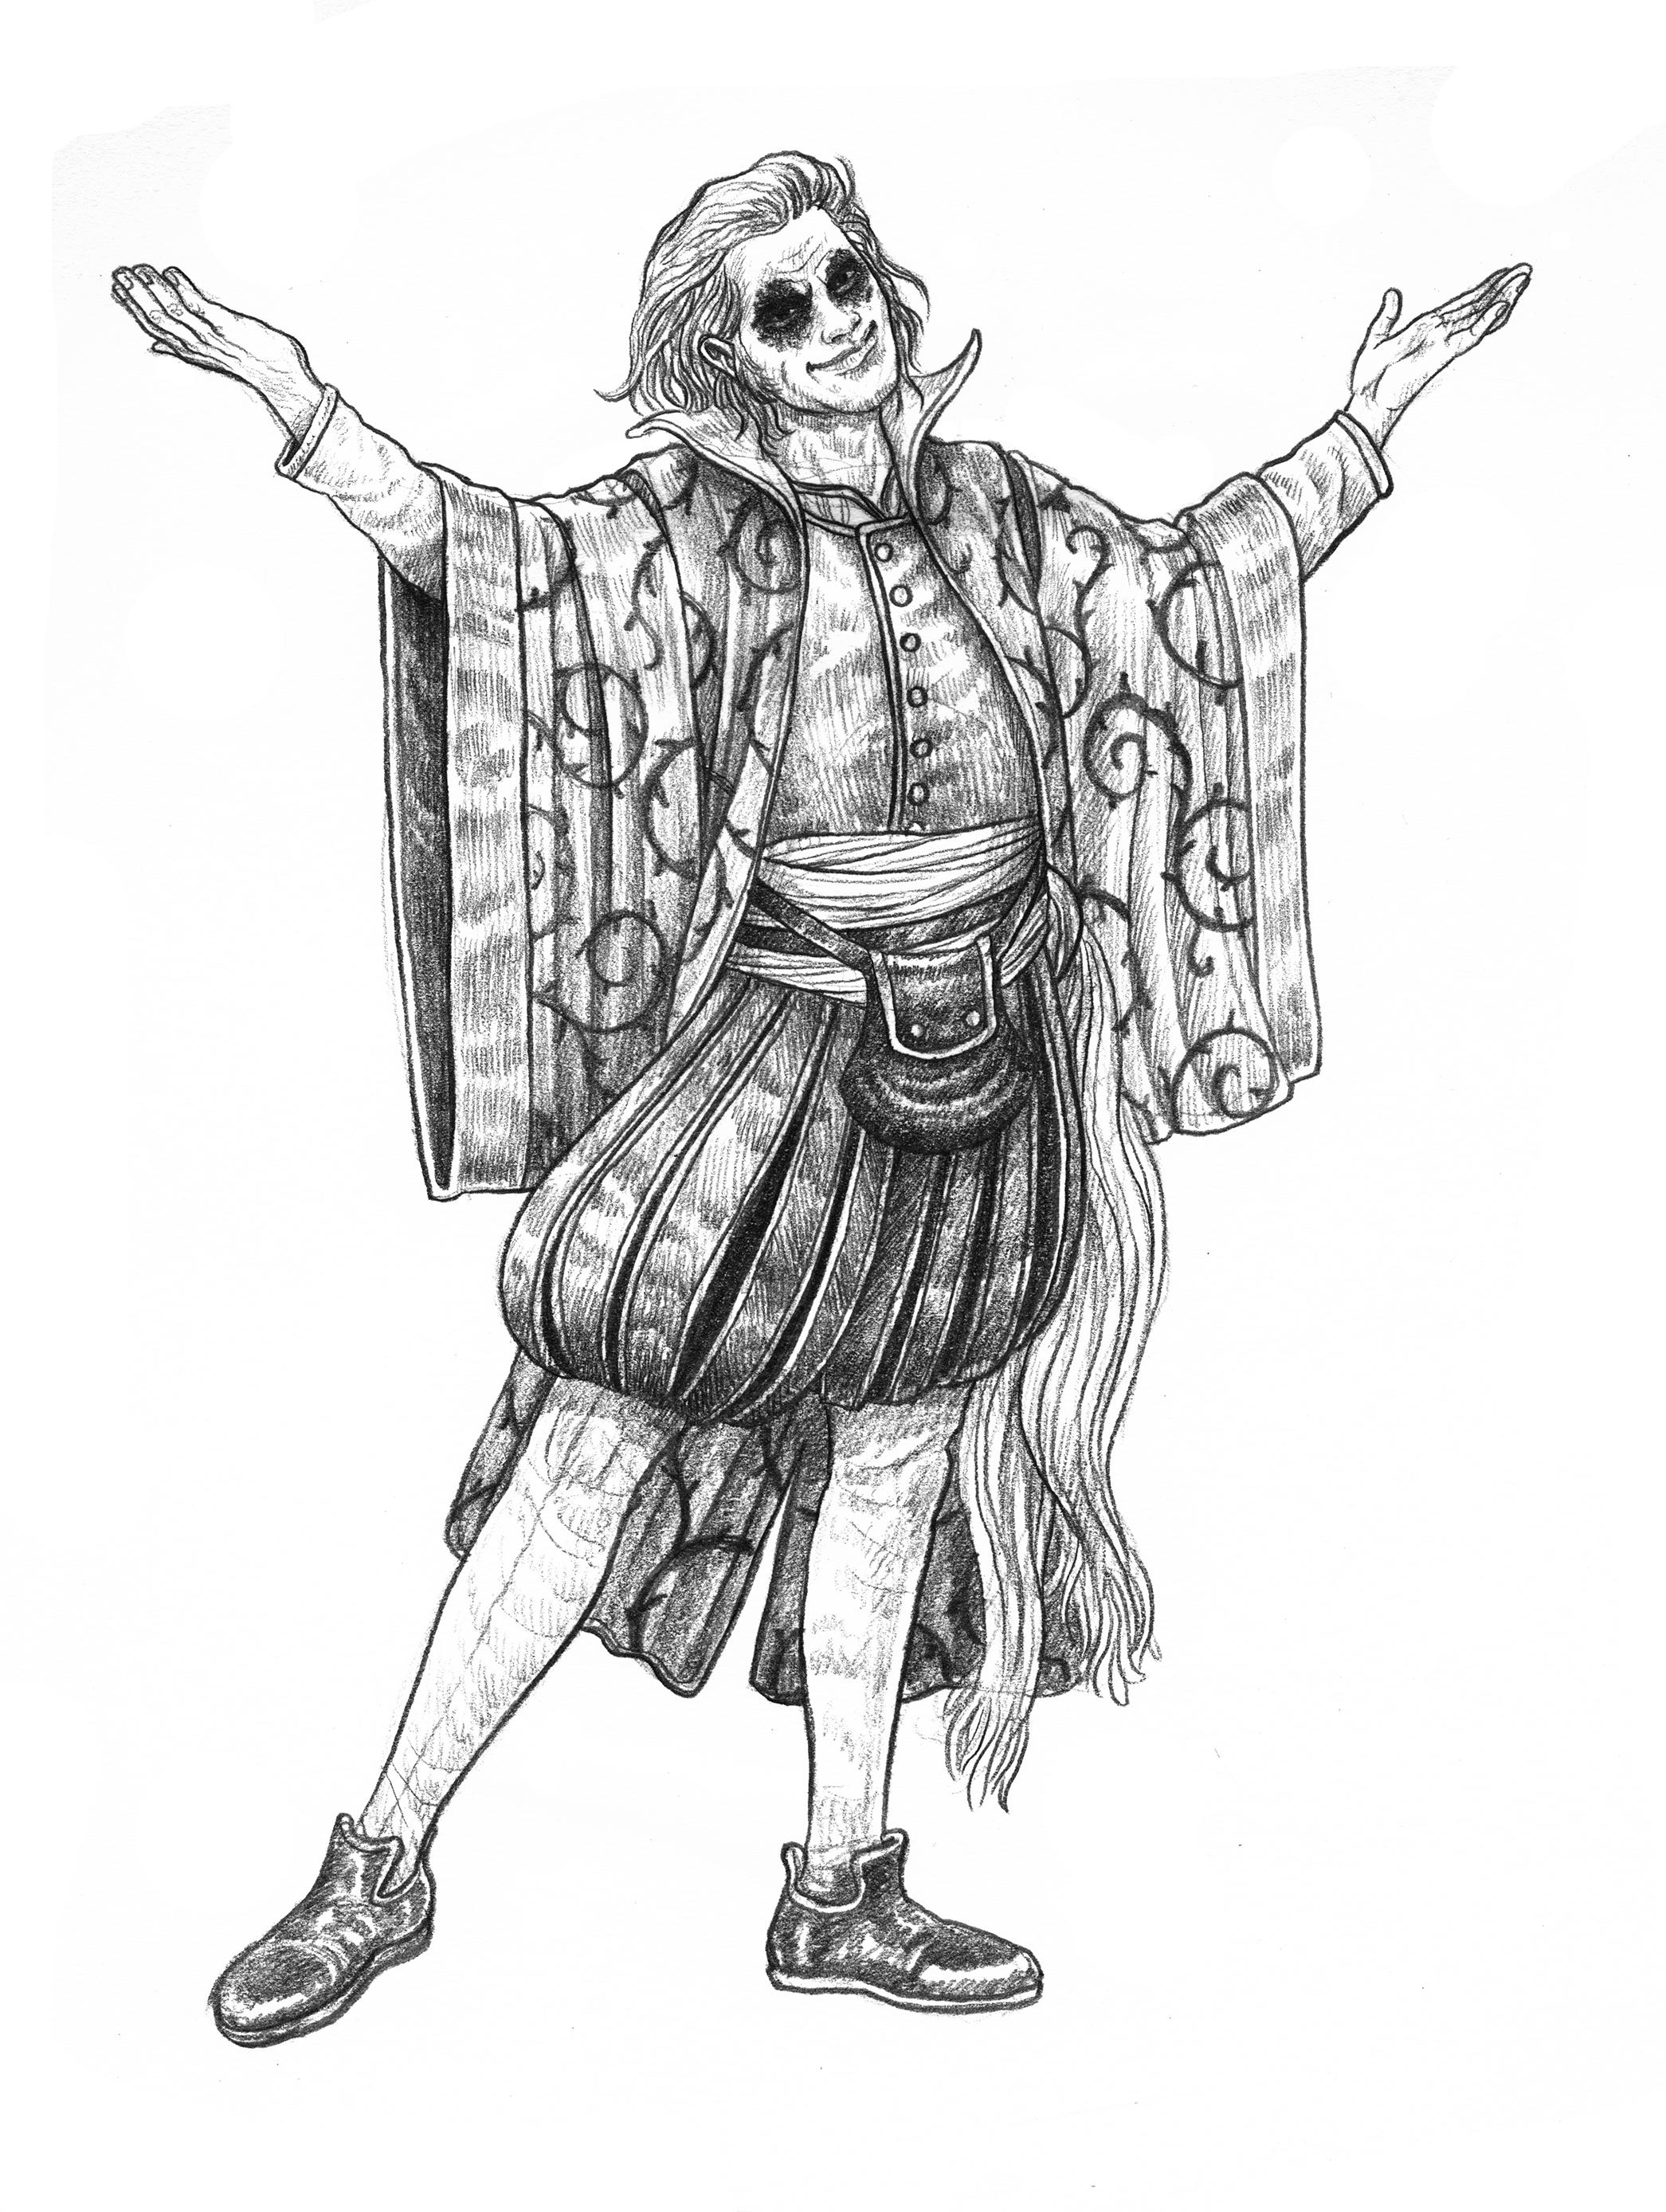 ZWEIHÄNDER Grim & Perilous RPG: Jester (Image: Grim & Perilous Studios)